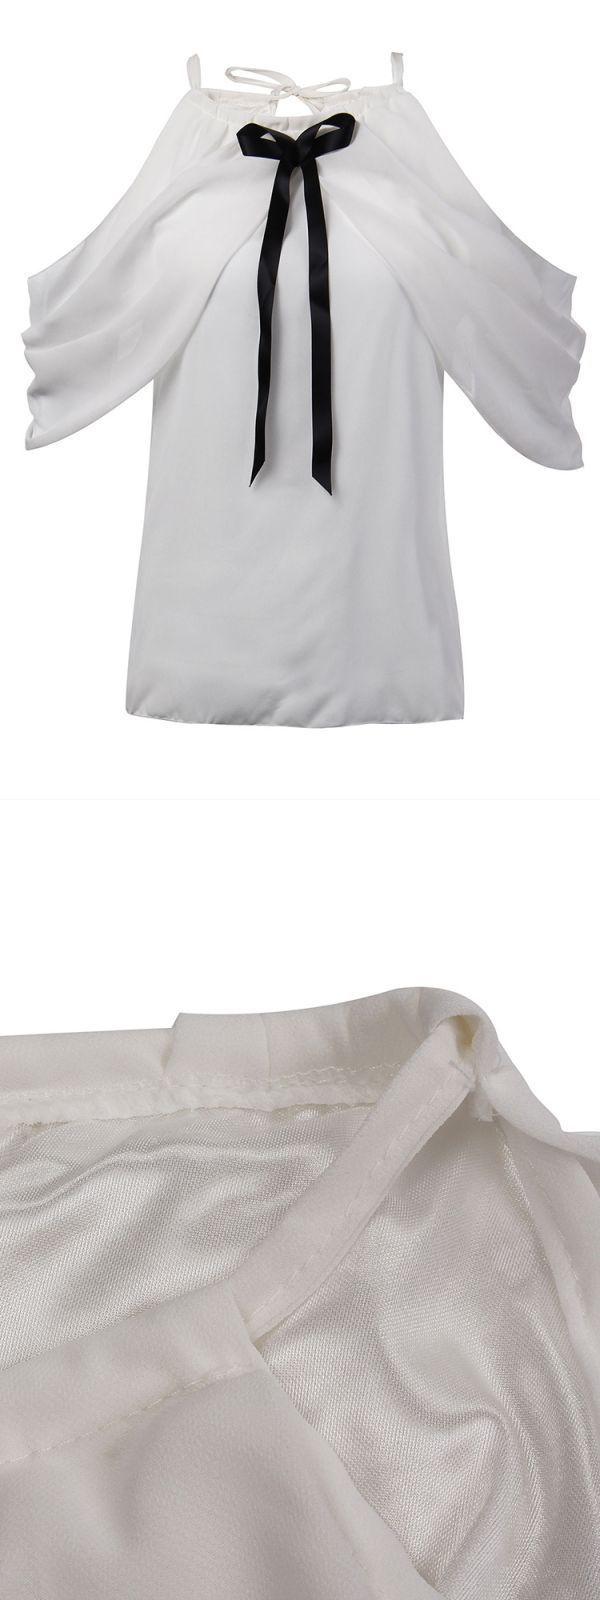 Elegant sexy women white halter off shoulder bow pleated chiffon blouse asda george women#8217;s blouses #girl #blouse #car #little #girl #blouses #saree #blouse #girl #image #womens #button #down #blouses